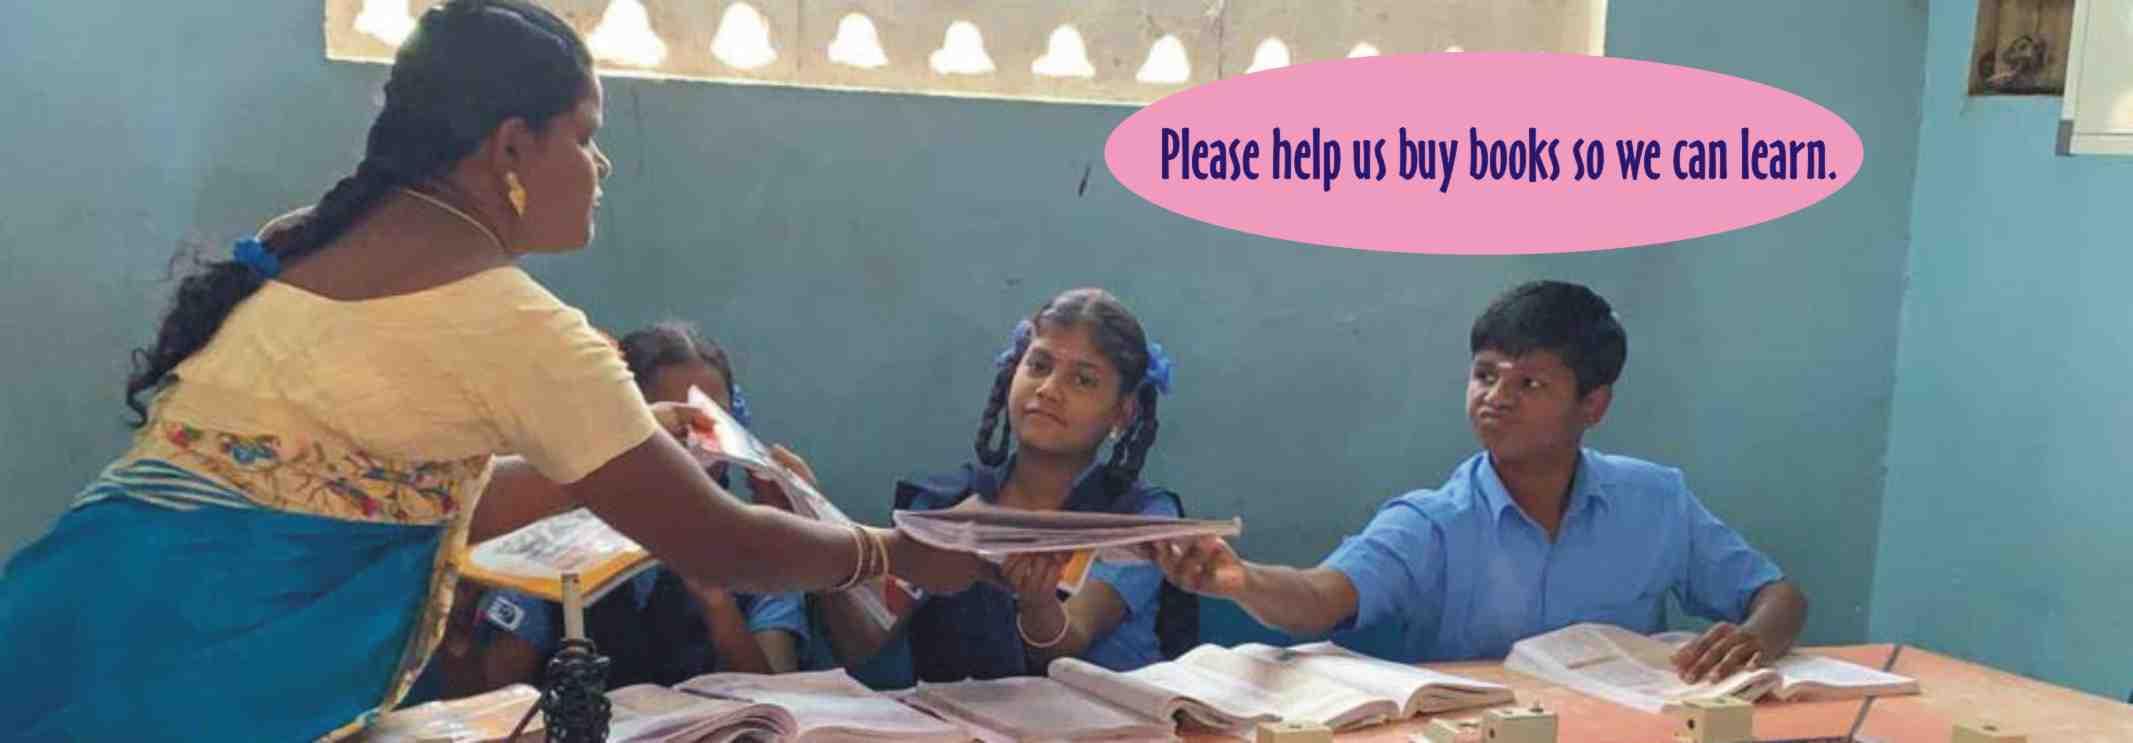 girl in class 03.jpg